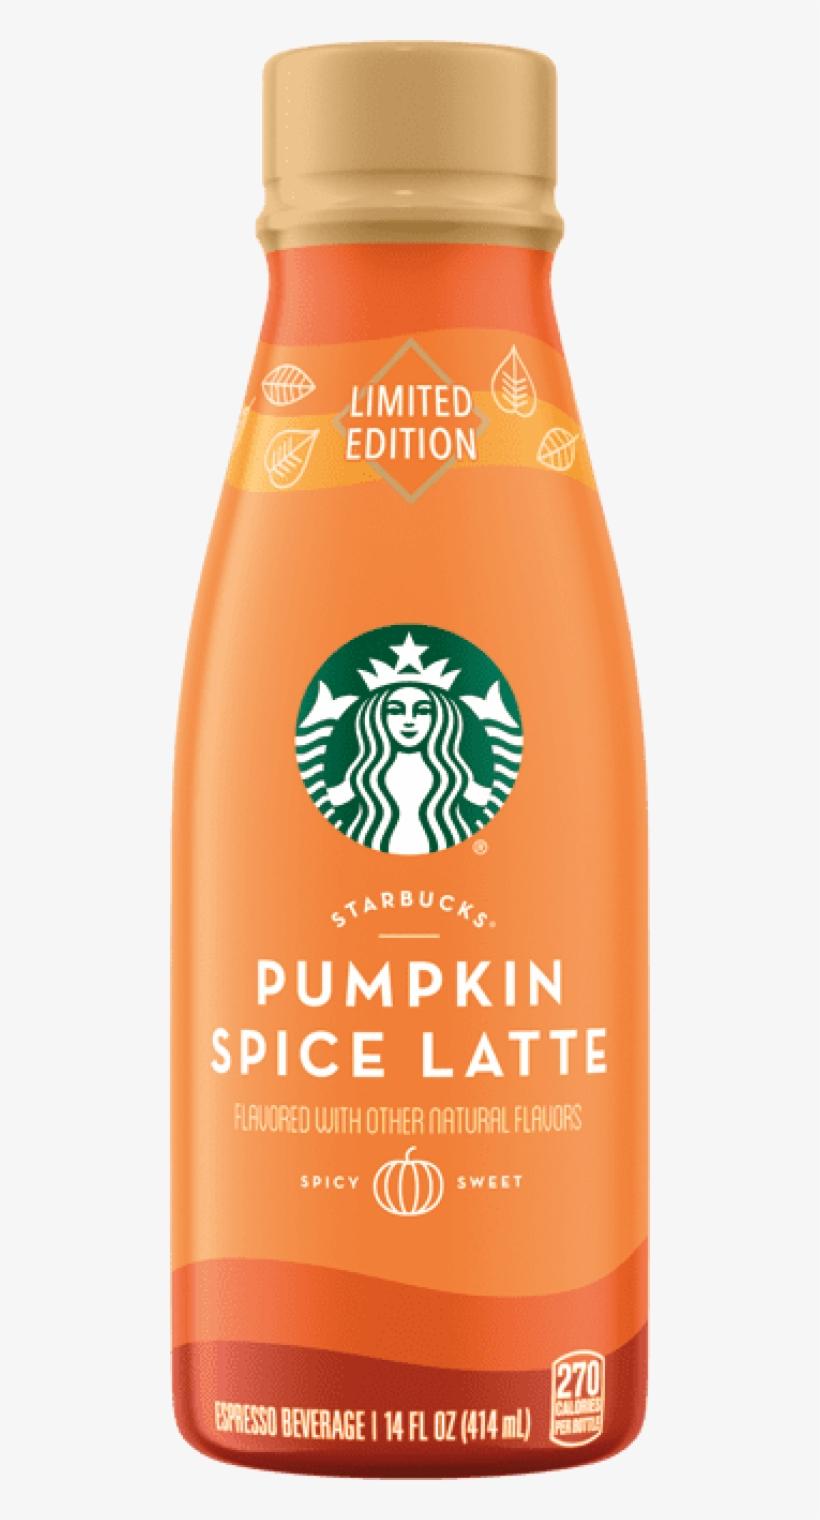 Starbucks Pumpkin Spice Latte Png Png Stock - Limited Edition Starbucks Pumpkin Spice Caffe Latte, transparent png #158457